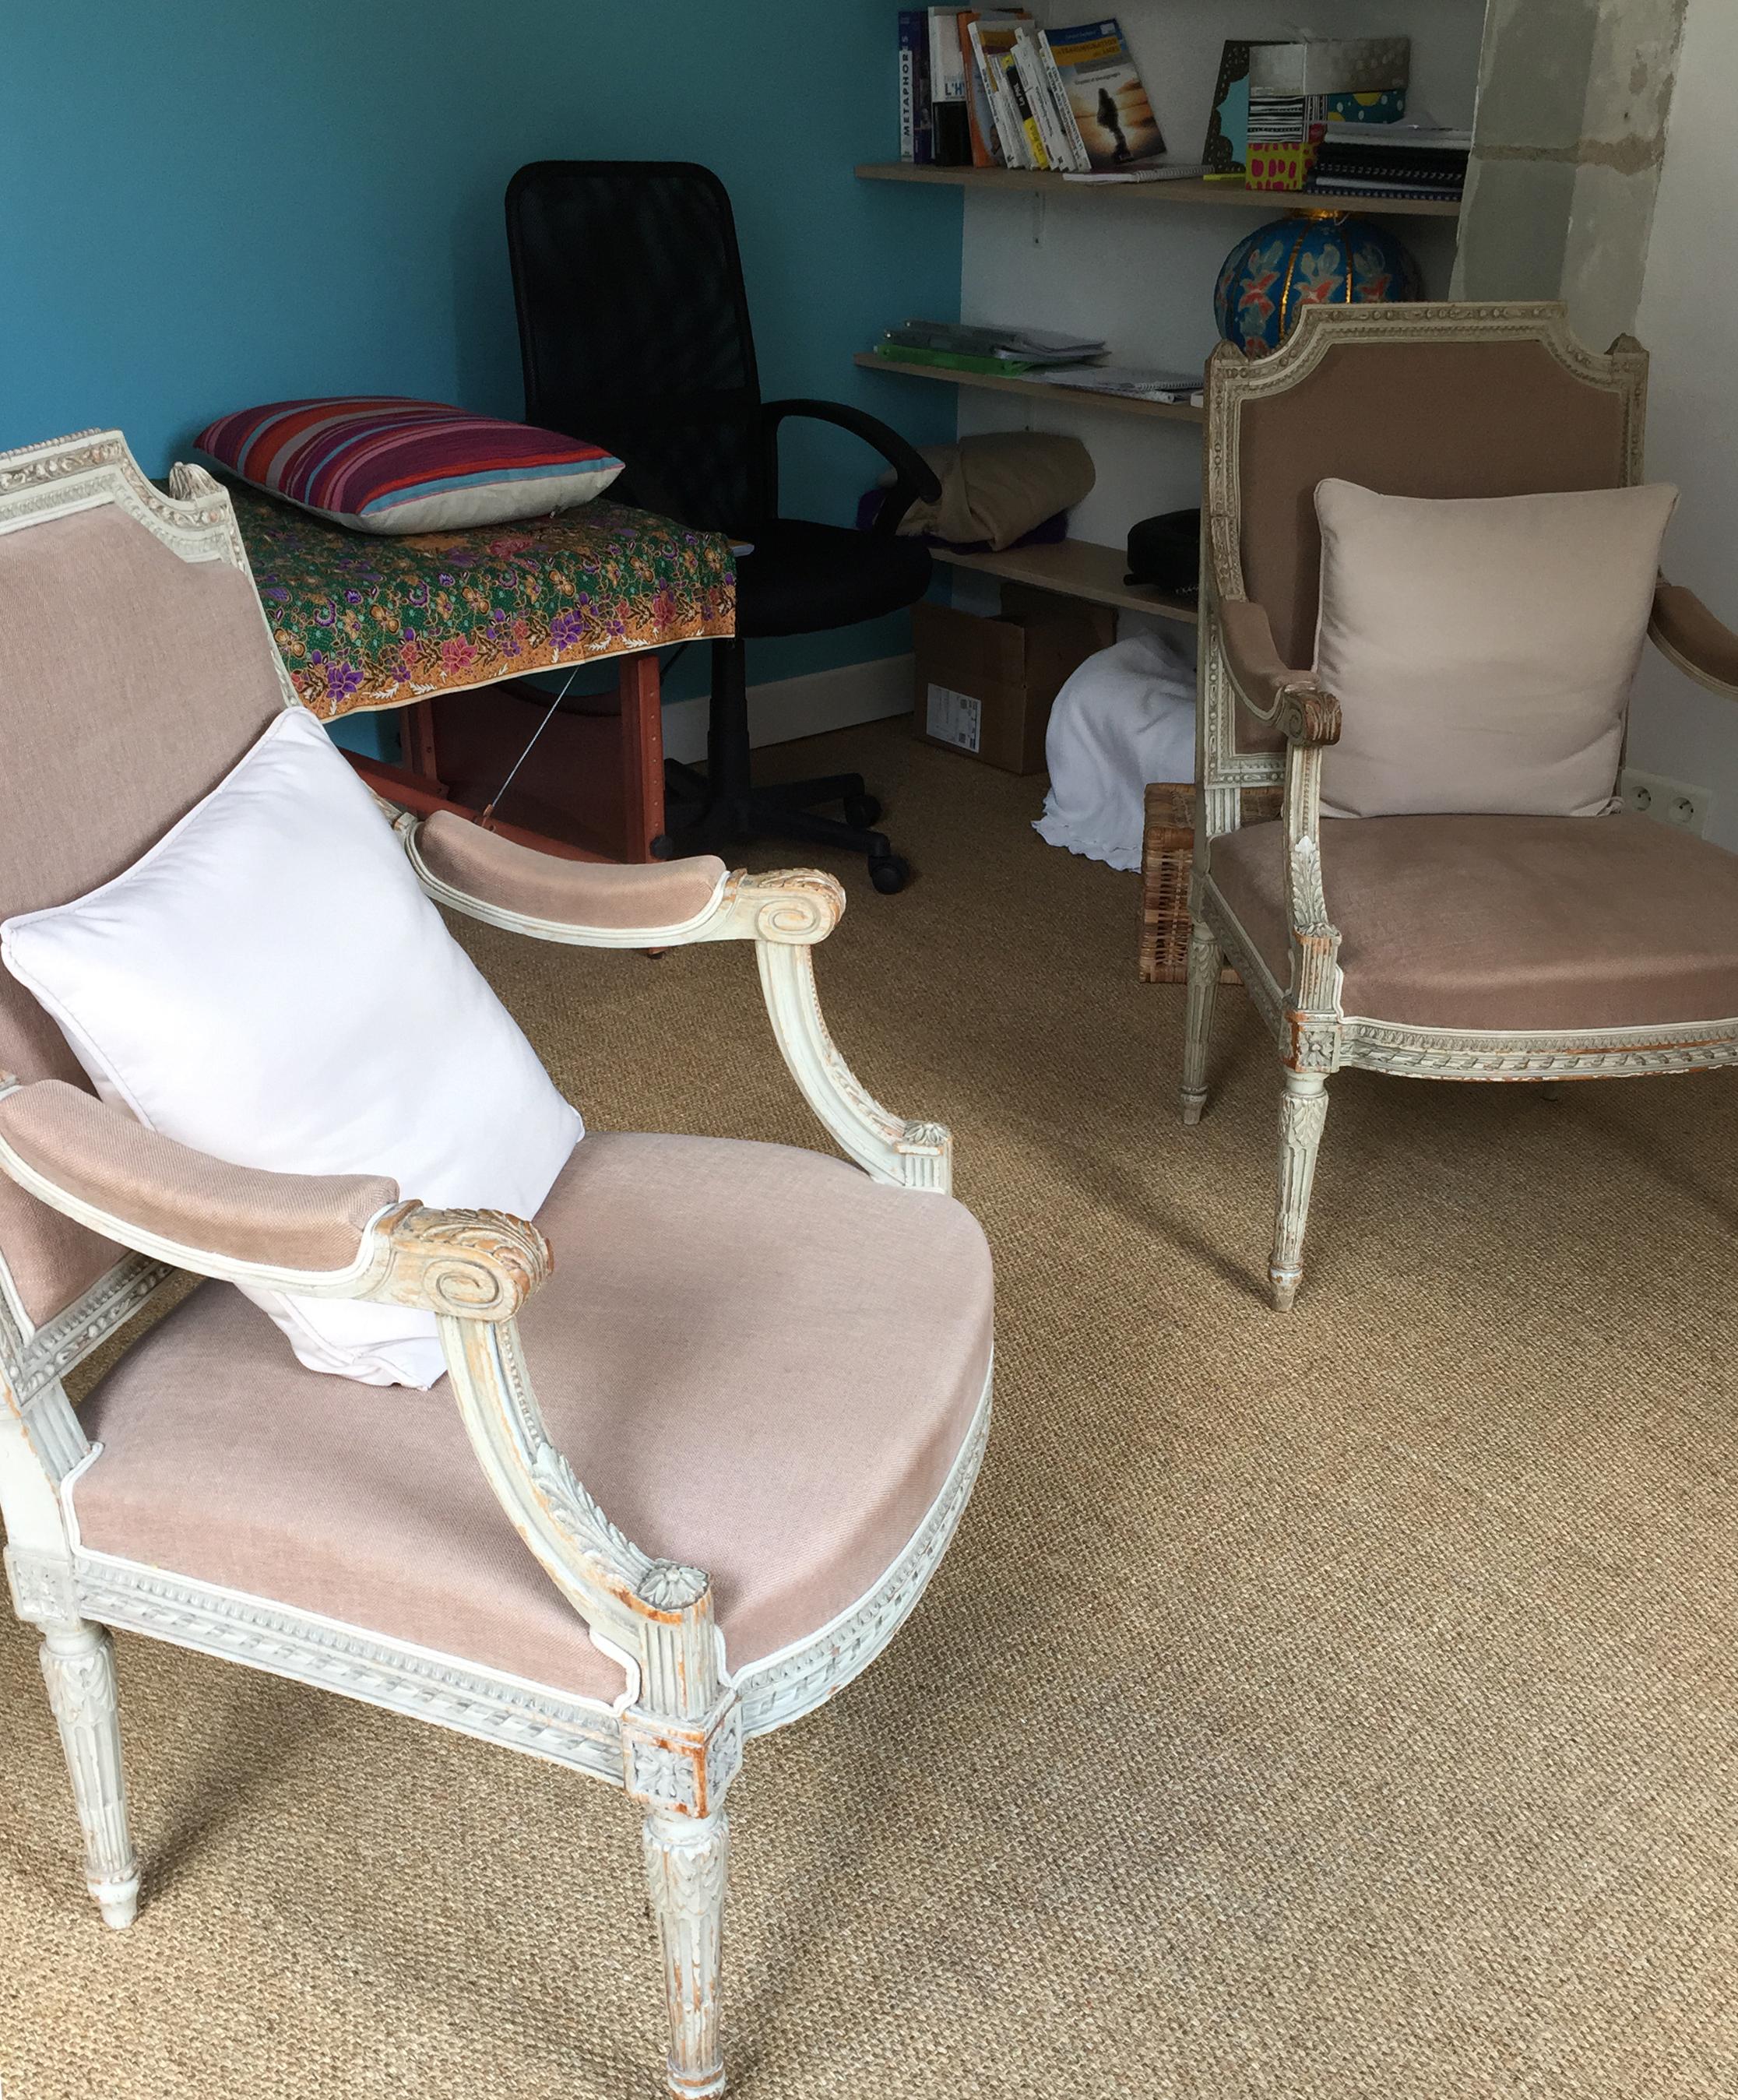 Quel fauteuil choisir?